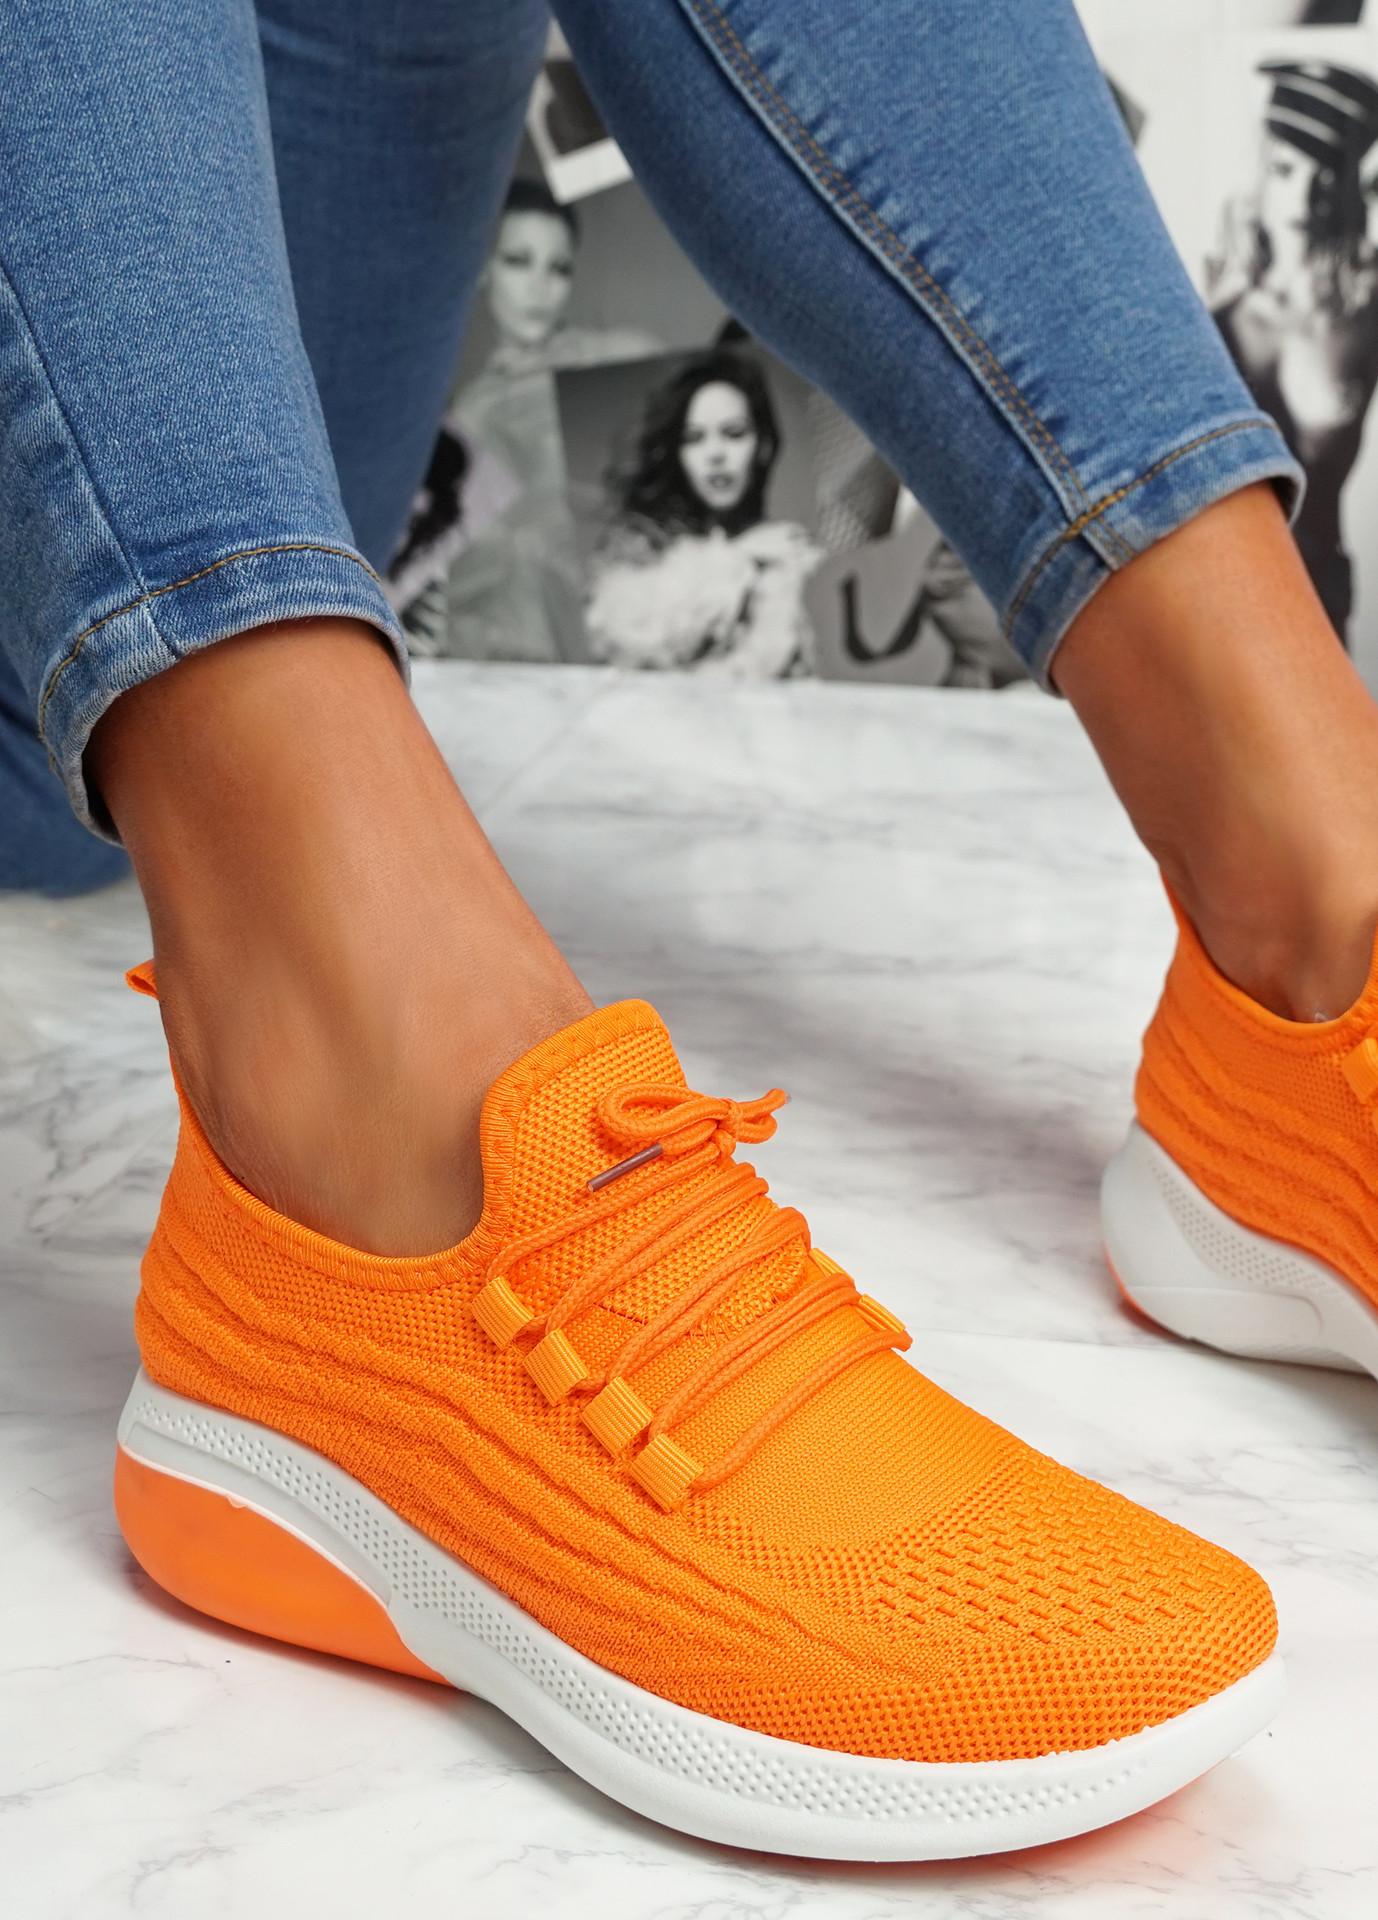 Finy Orange Knit Sport Trainers